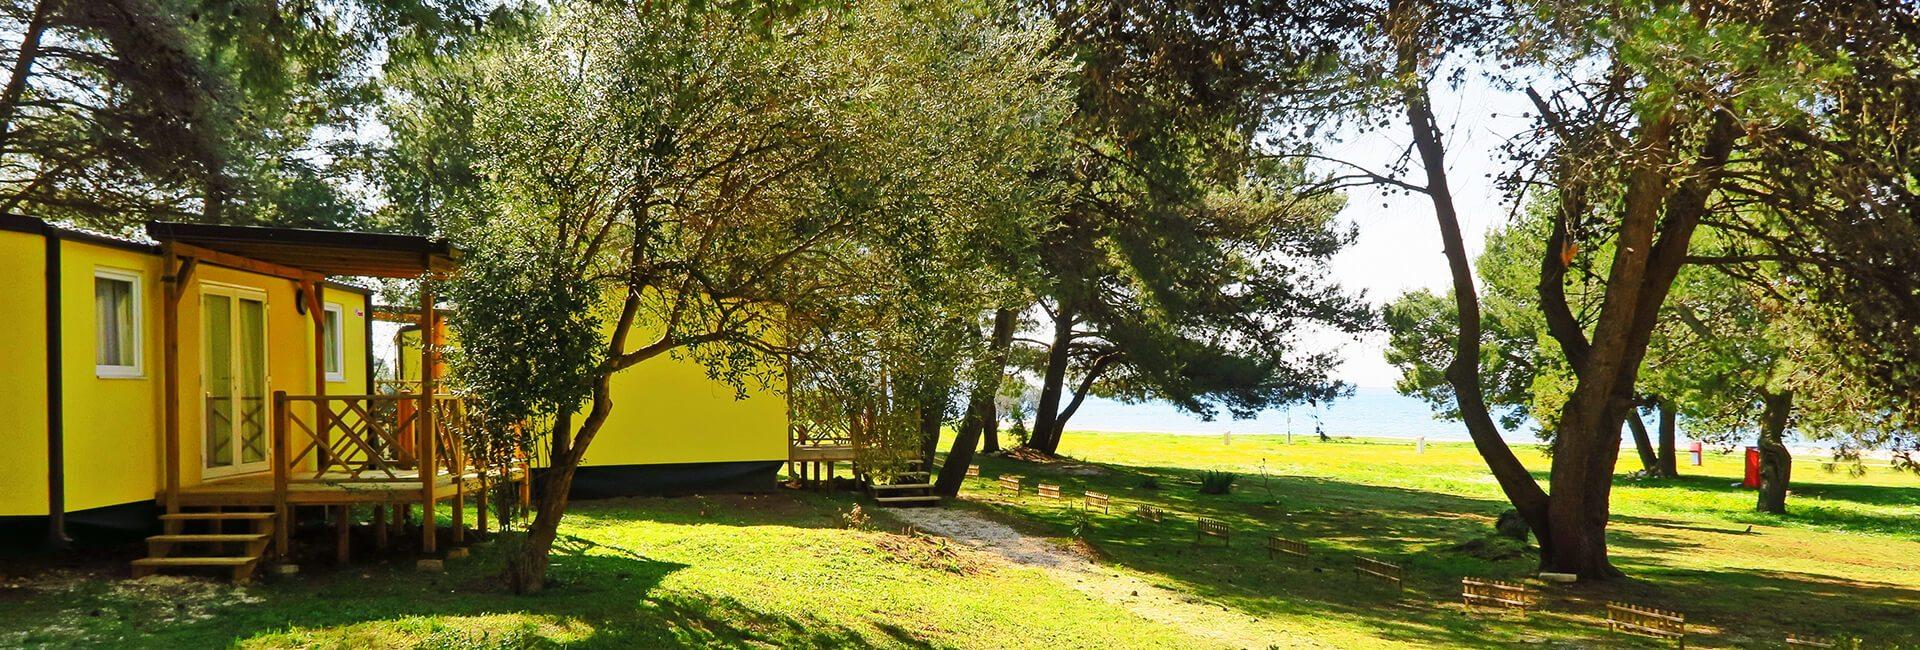 Camping Pineta Fažana - mobilne kućice uz more